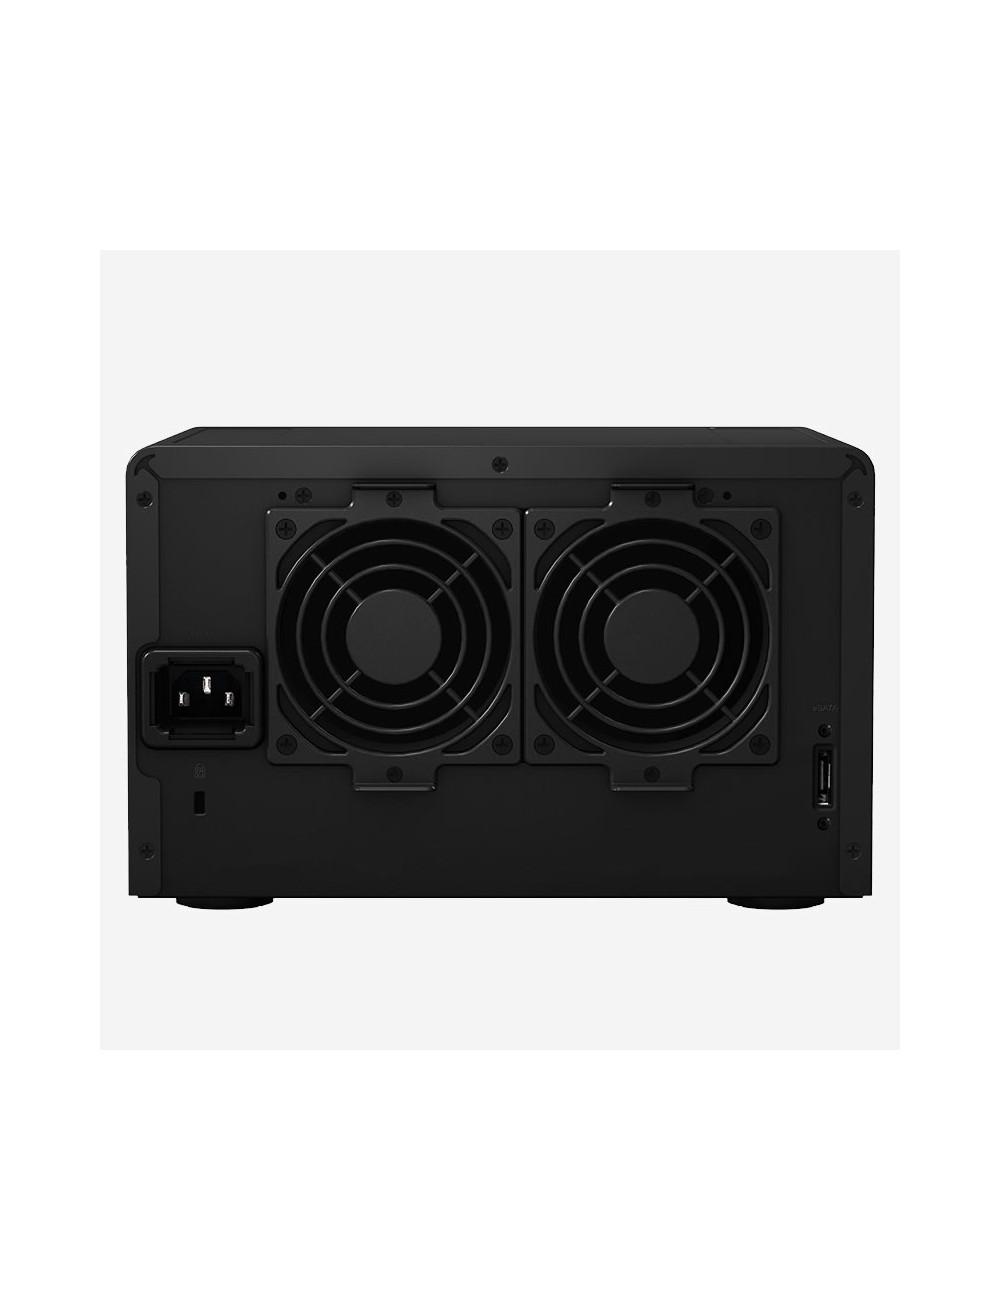 Synology DS1019+ NAS Server WD BLUE 15TB (5x3TB)